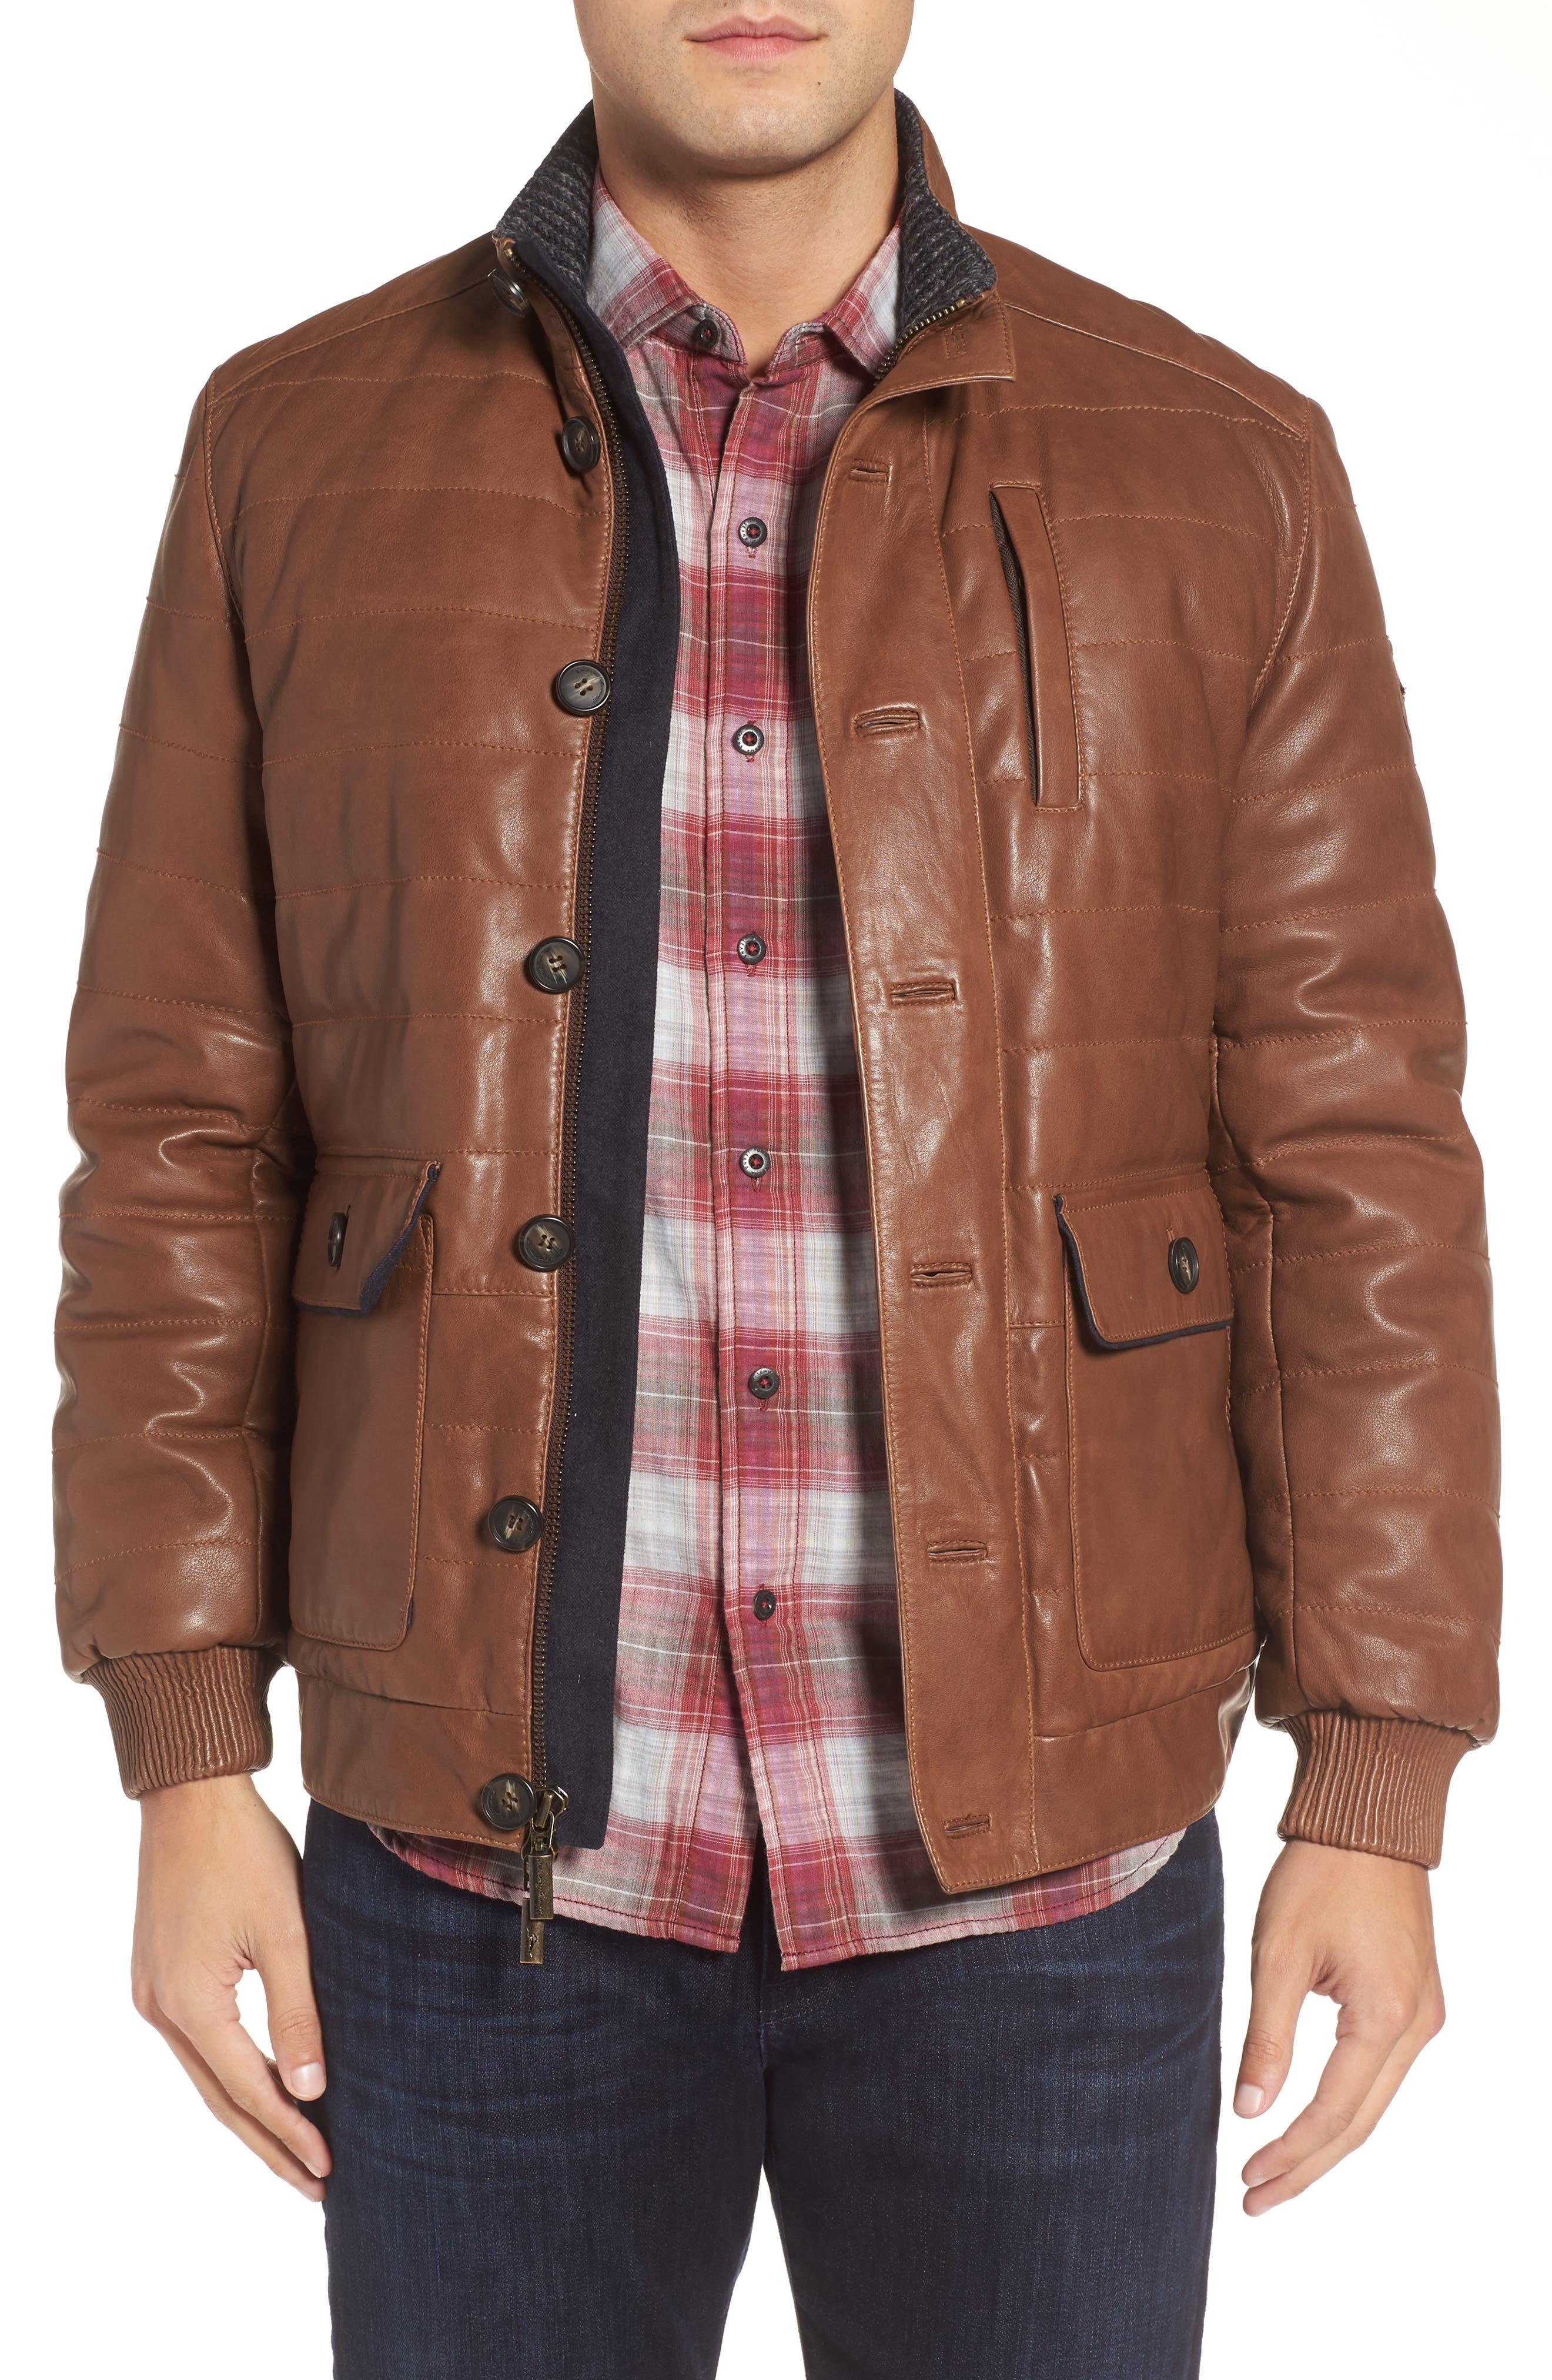 Alternate Image 1 Selected - Tommy Bahama Snowside Leather Bomber Jacket